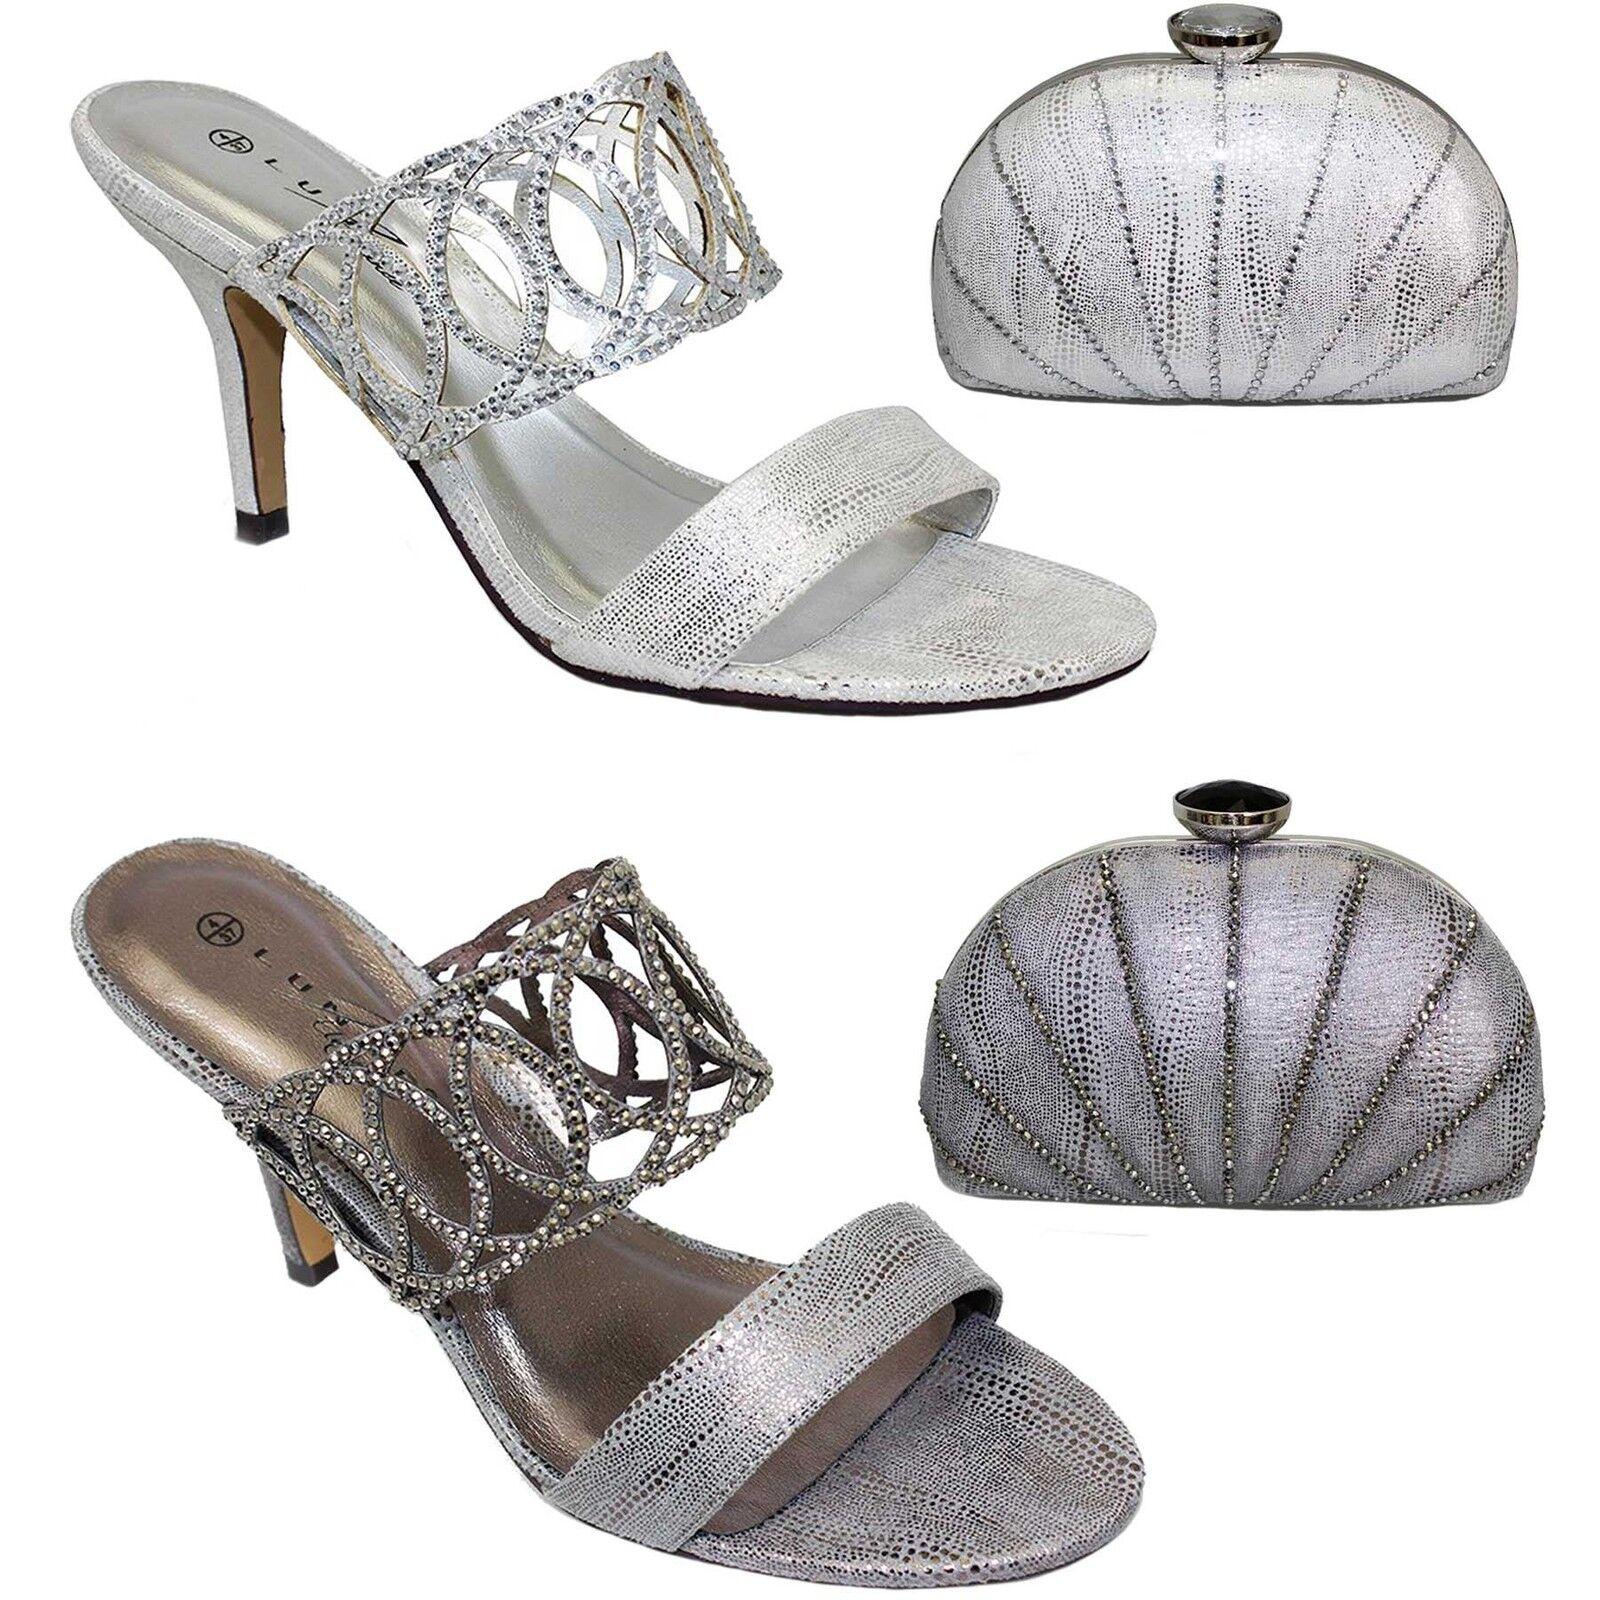 Flr356 Tatiana dames Soirée À Enfiler Strass Métallique mule talon haut chaussures